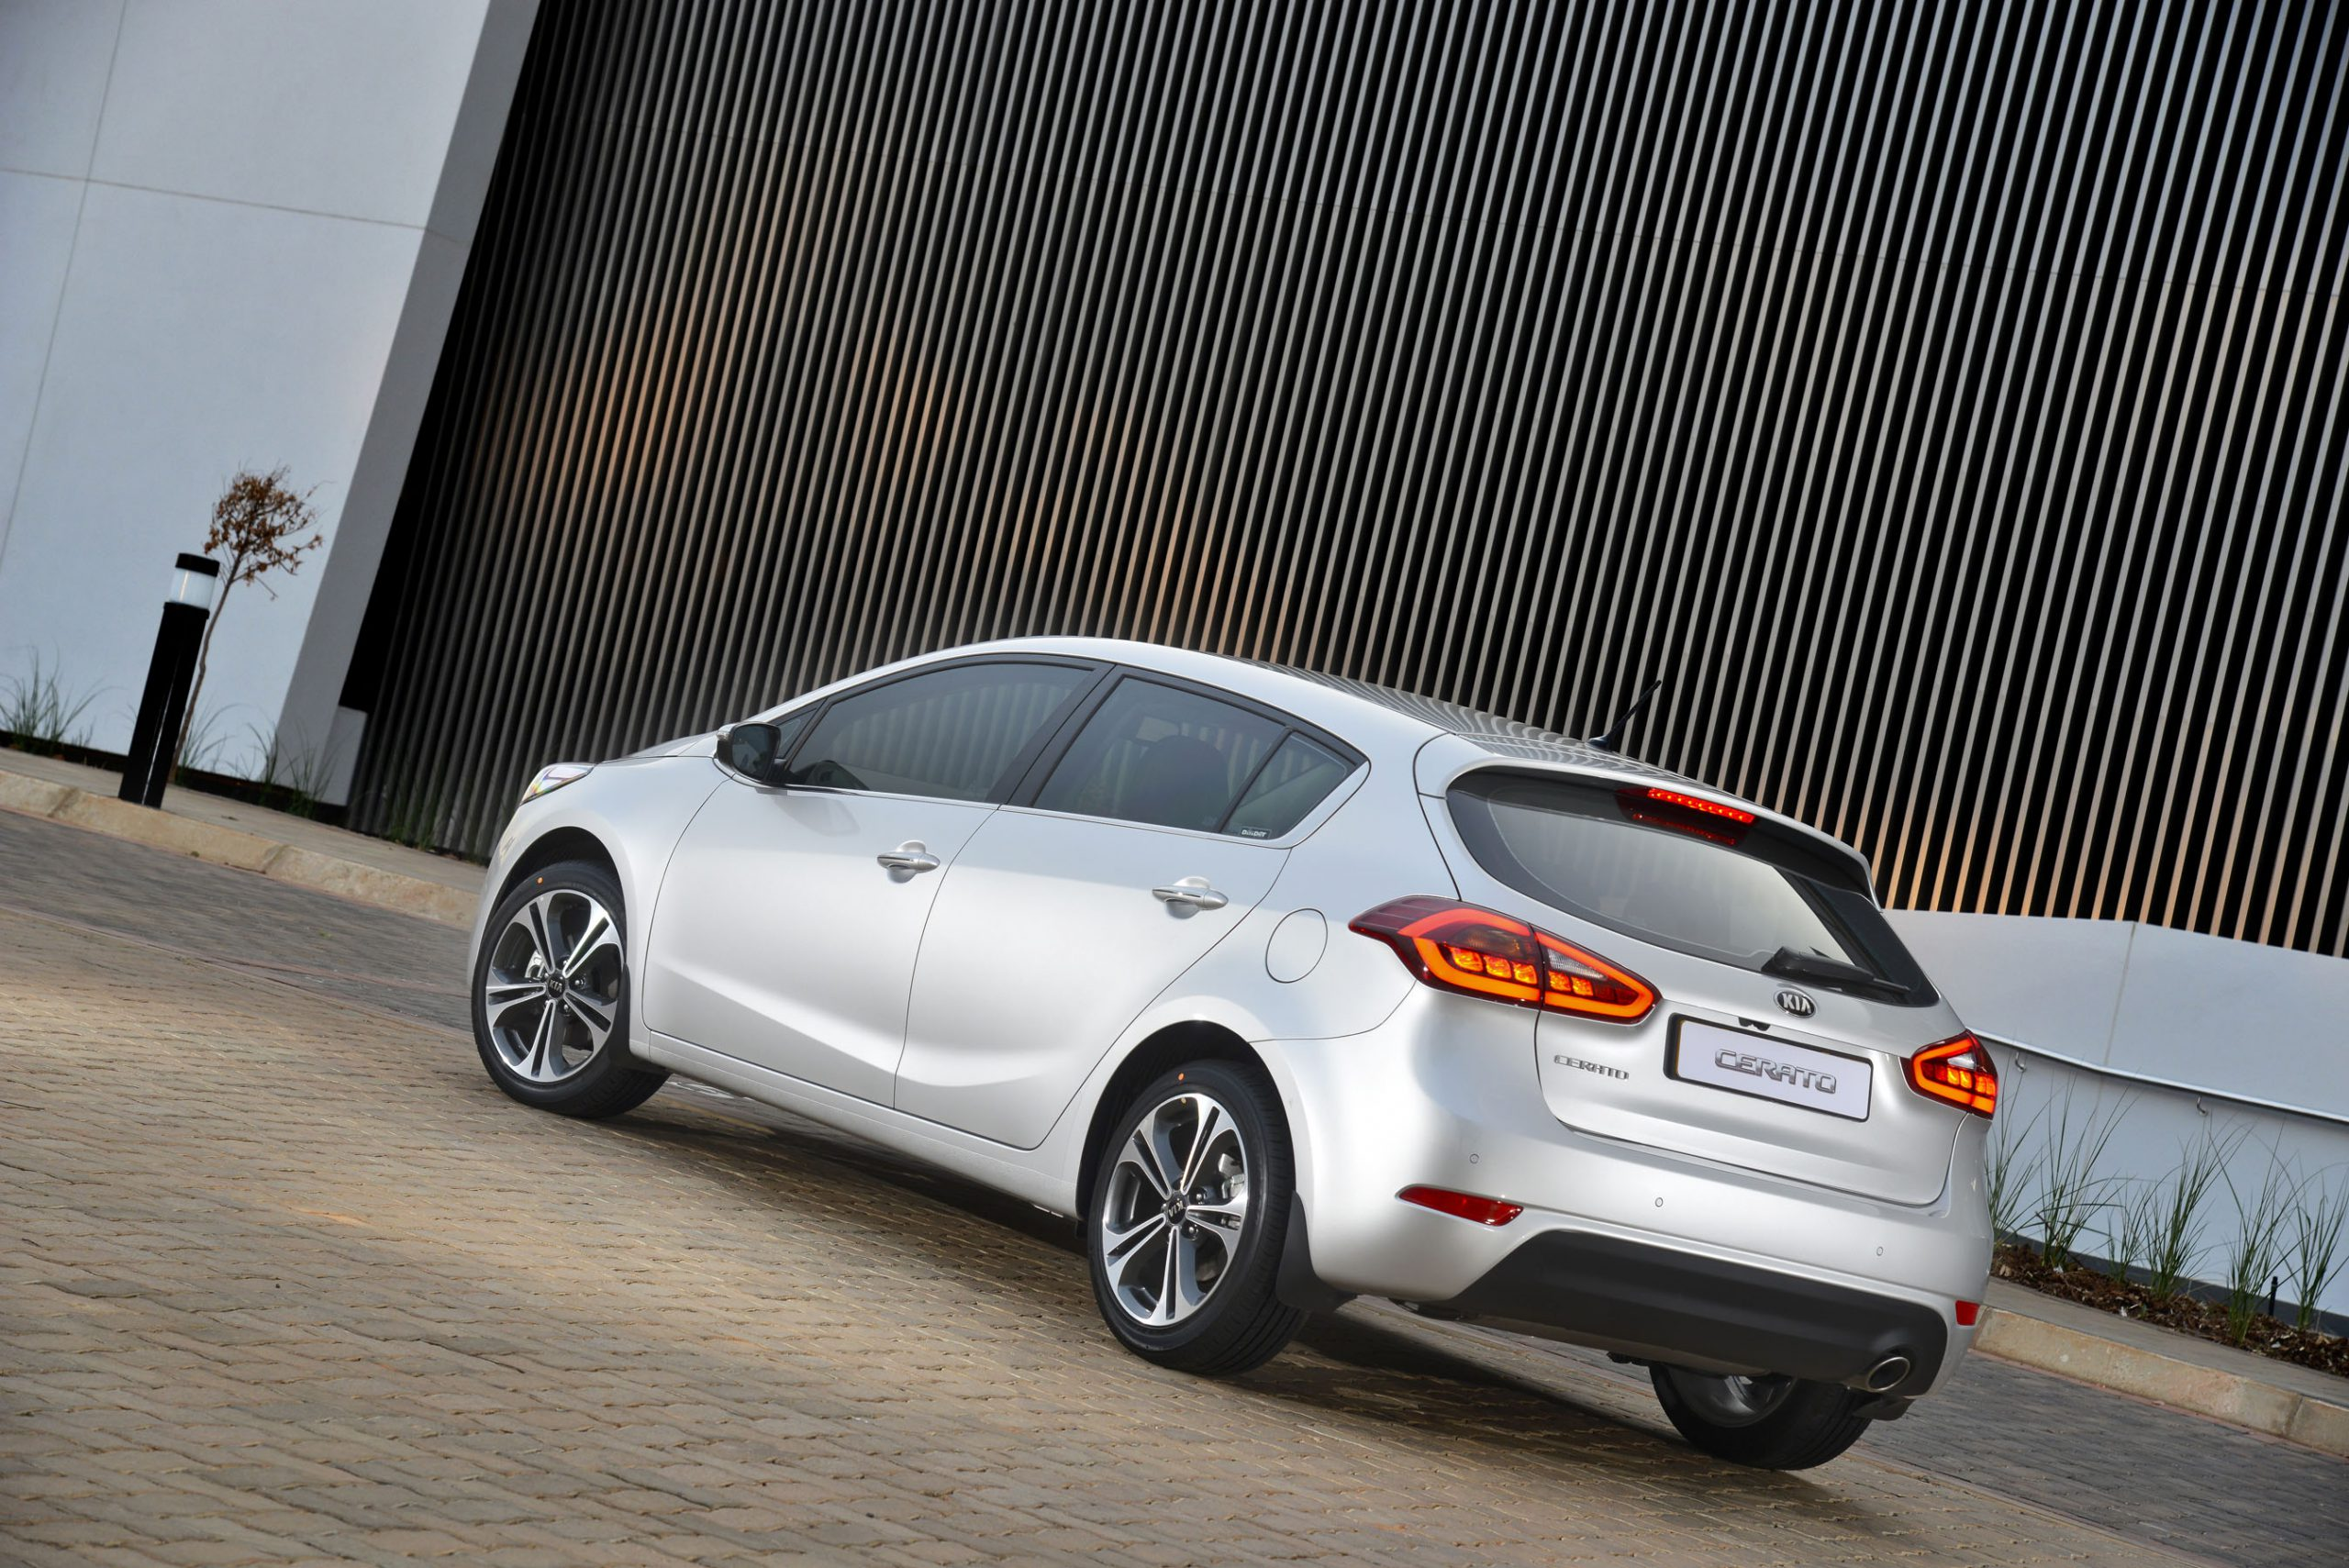 Kia Cerato Hatchback Lands: Latest News – Surf4cars